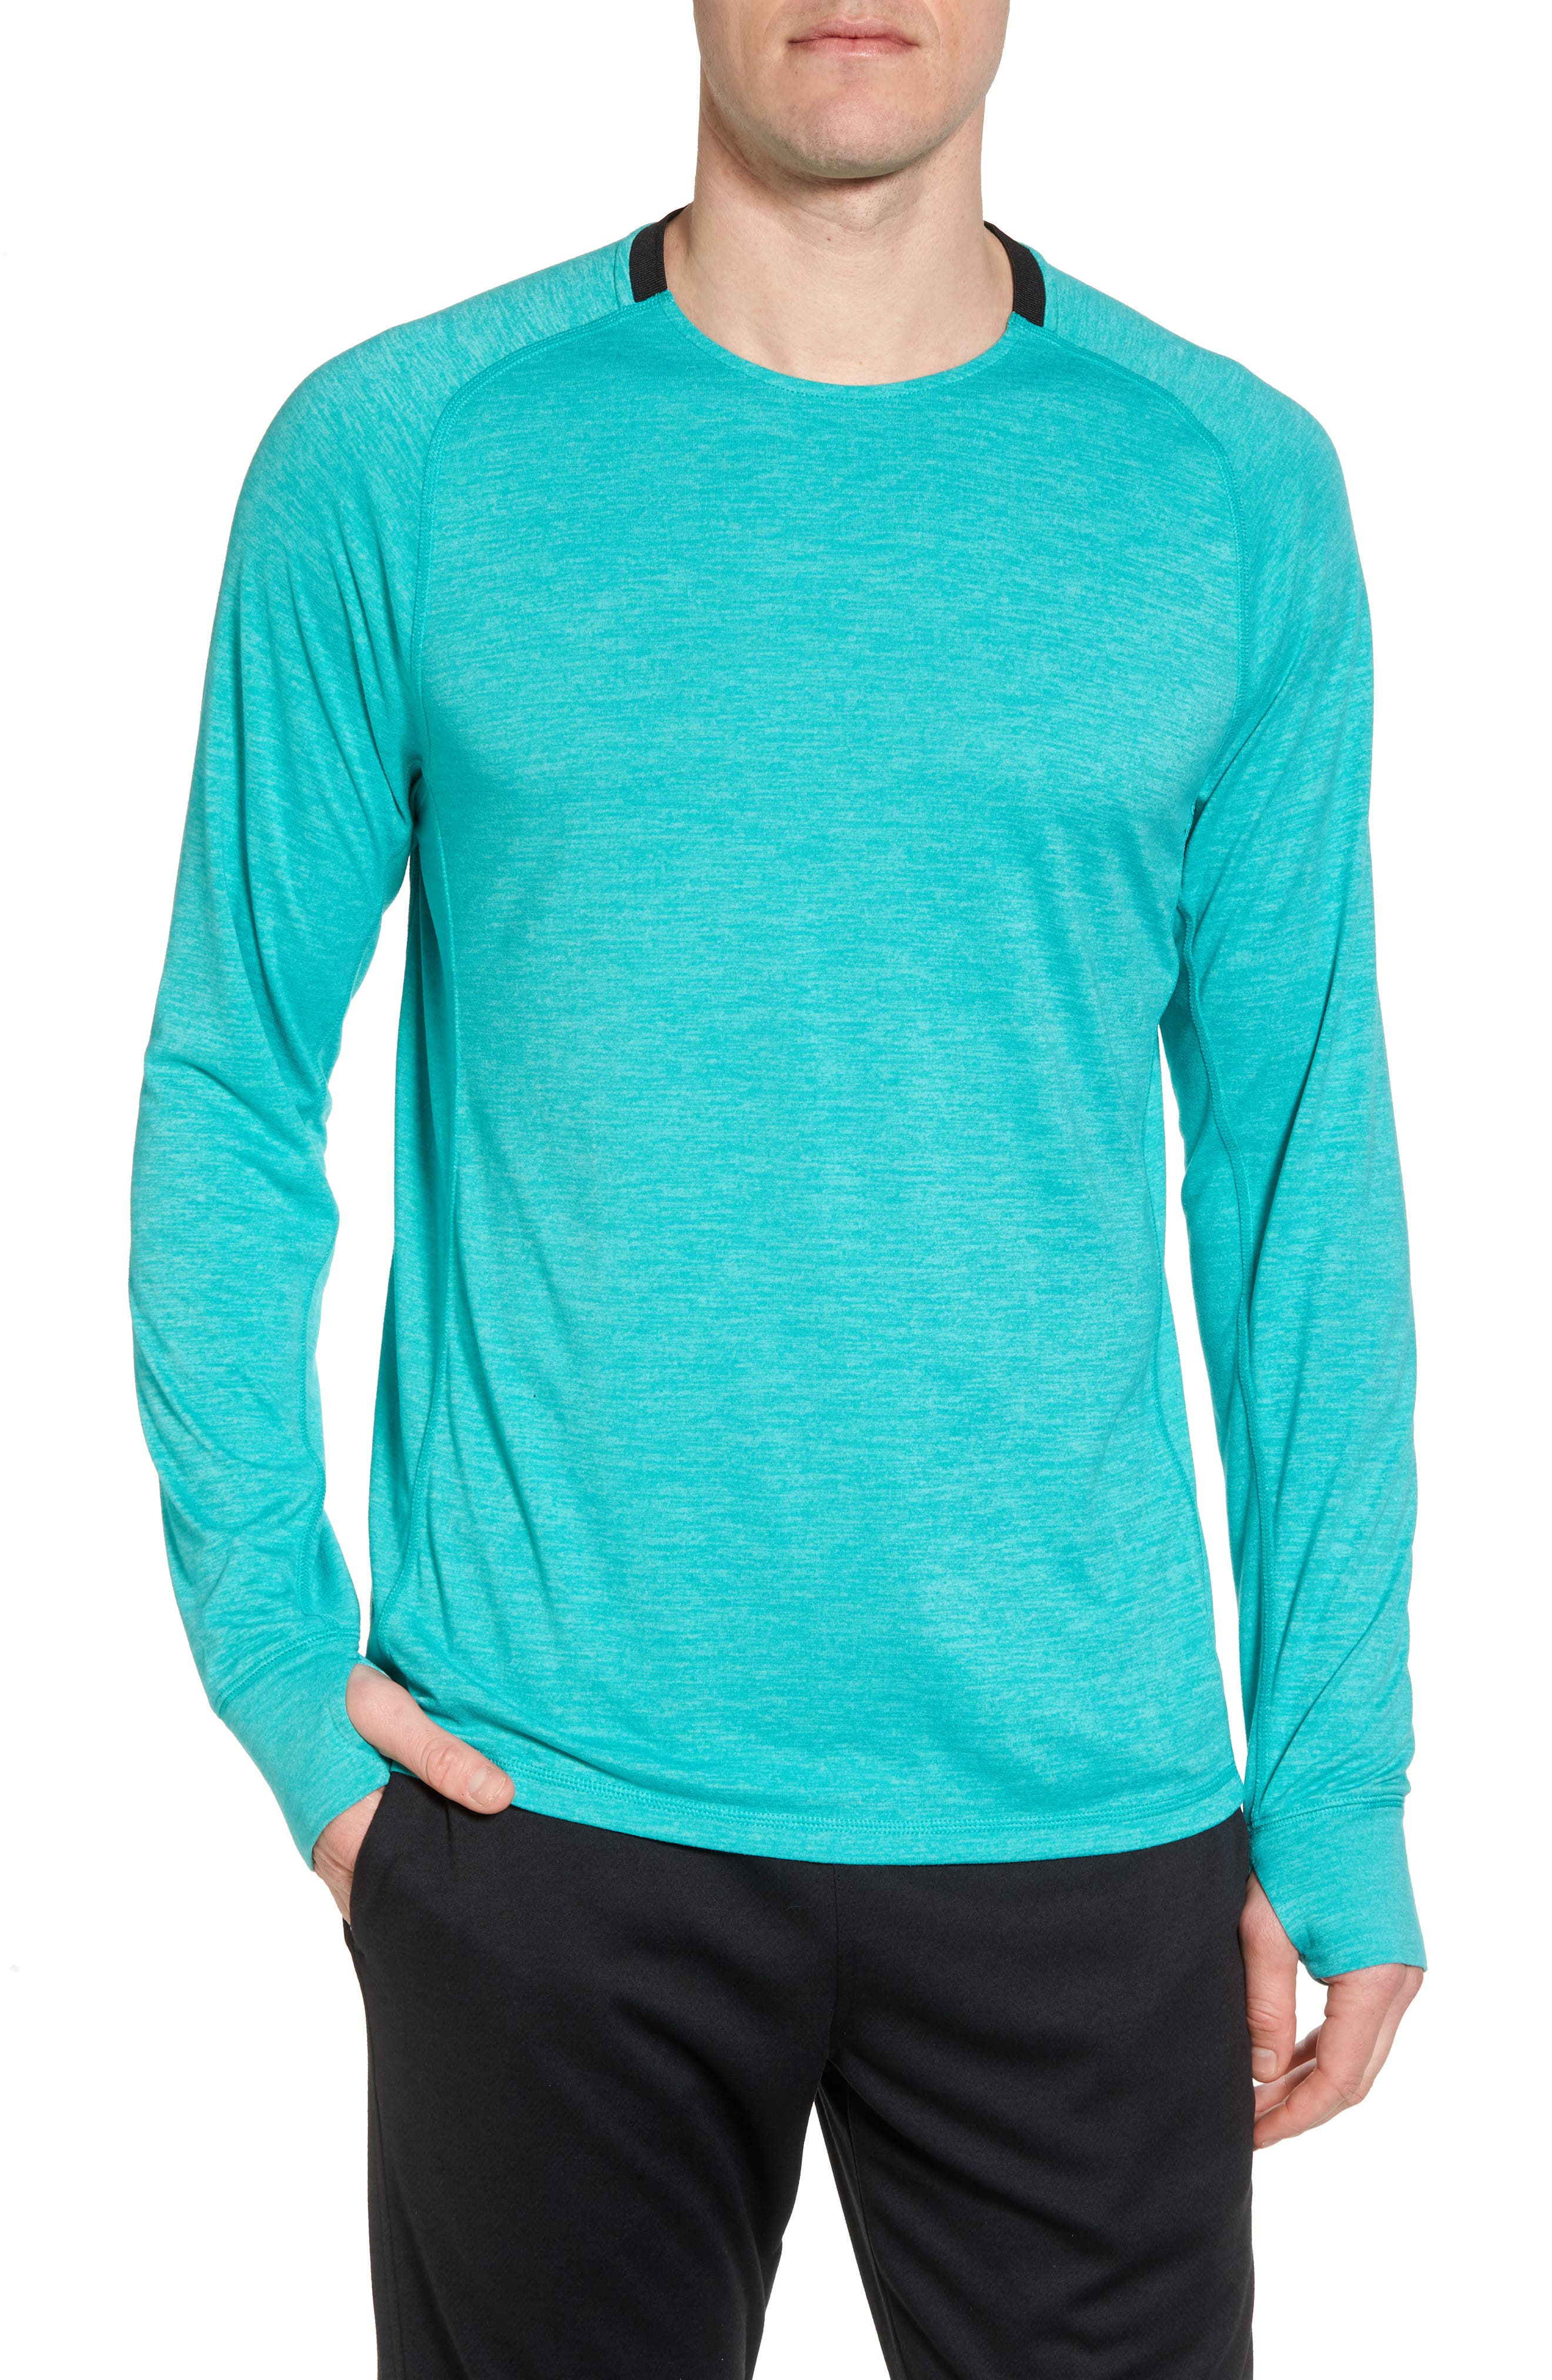 Zella Larosite Athletic Fit T-Shirt